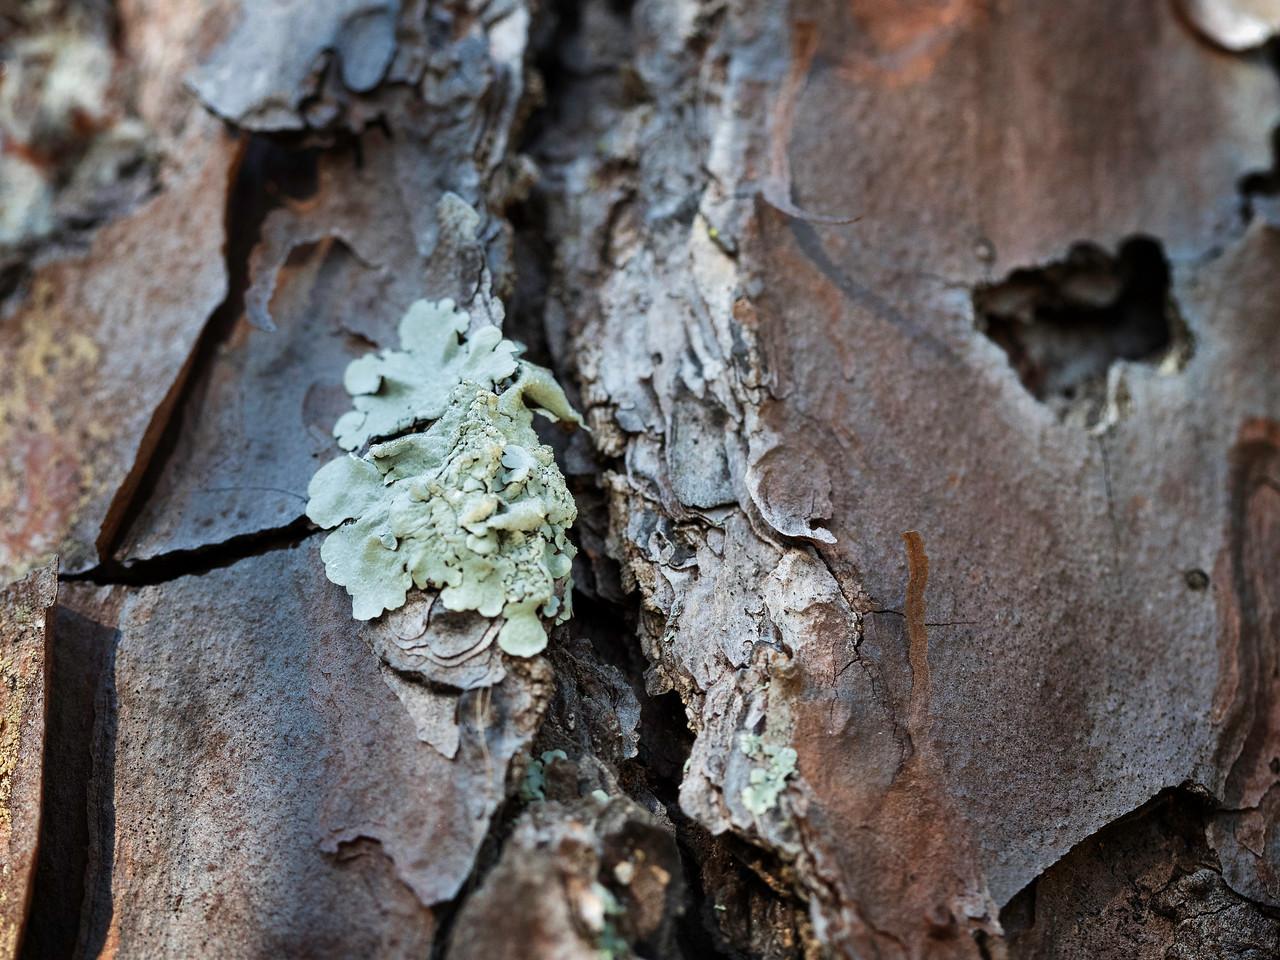 Liking the Lichen